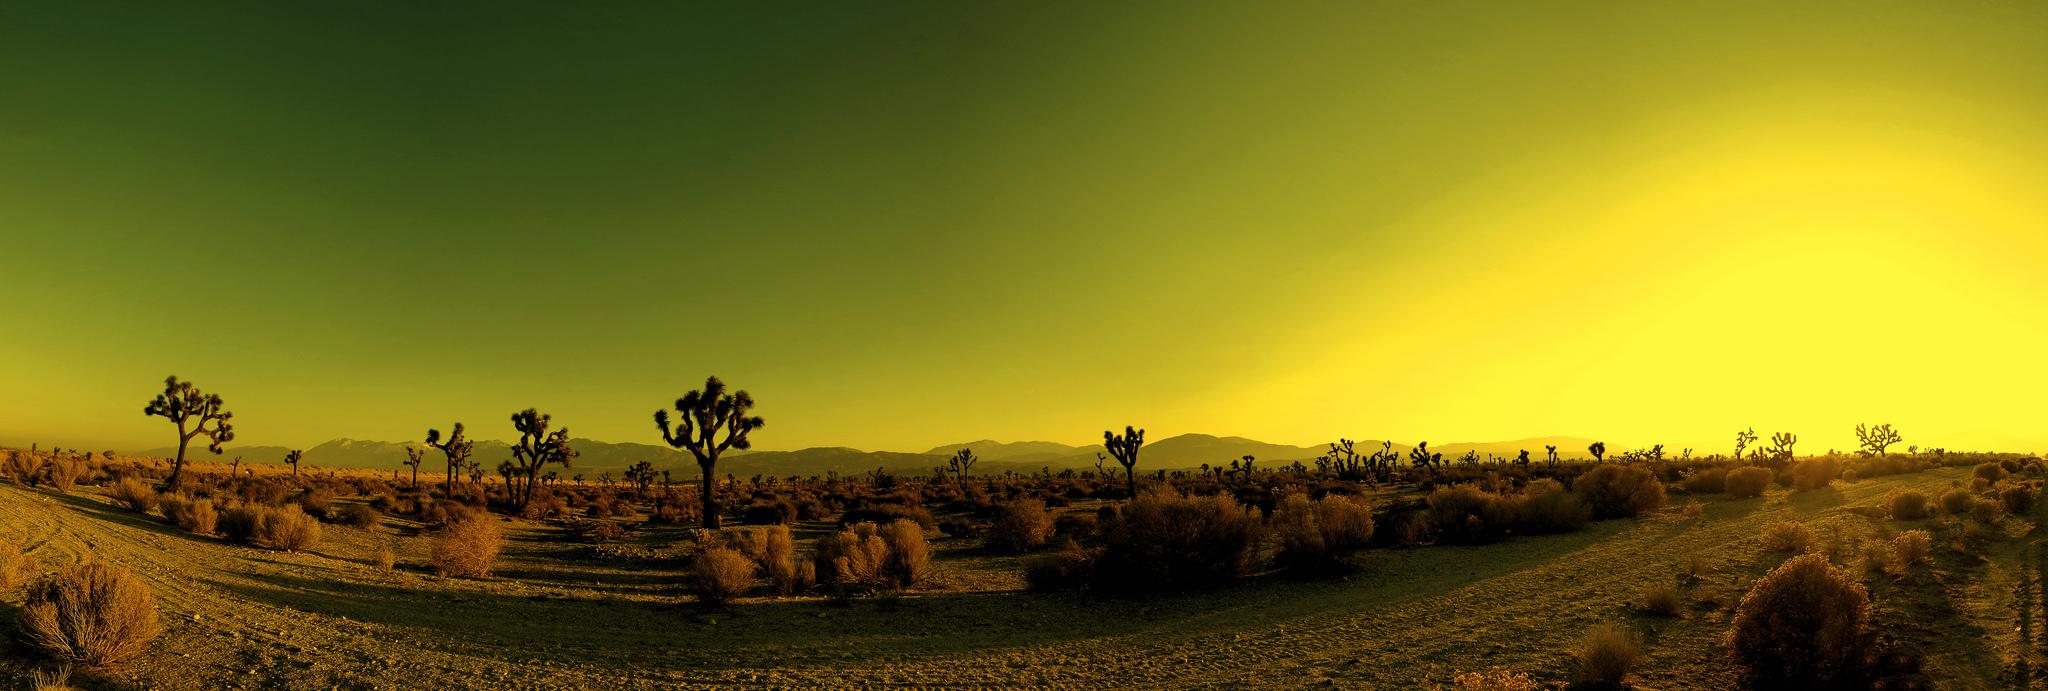 Landscape around Palmdale | Ⓒ Joseph Voves/Flickr